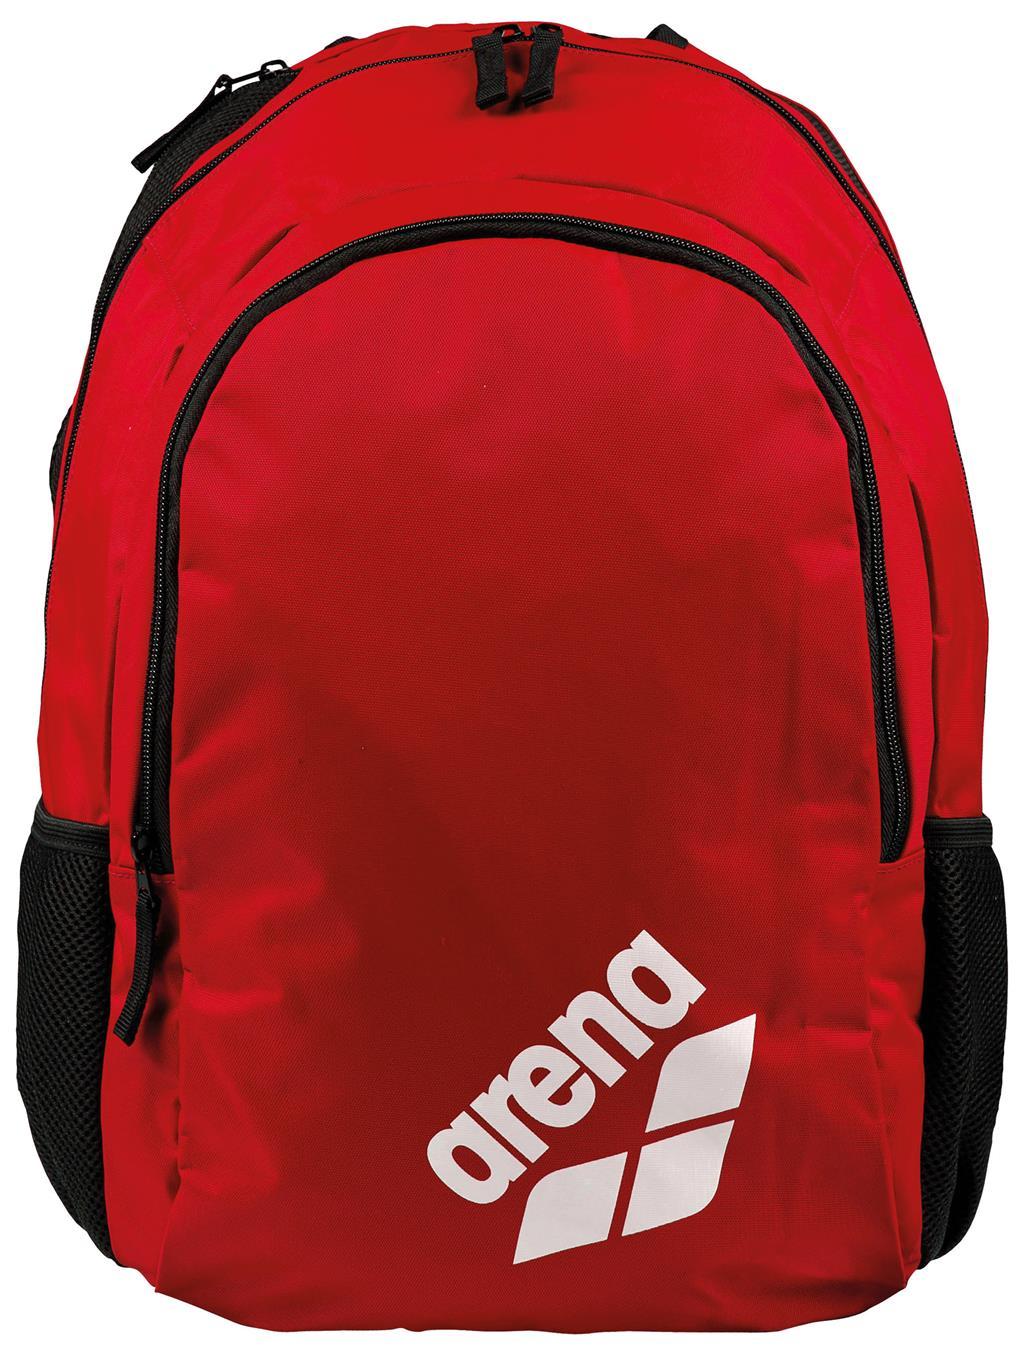 ARENA RUCKSACK RED SPIKY2 Backpack